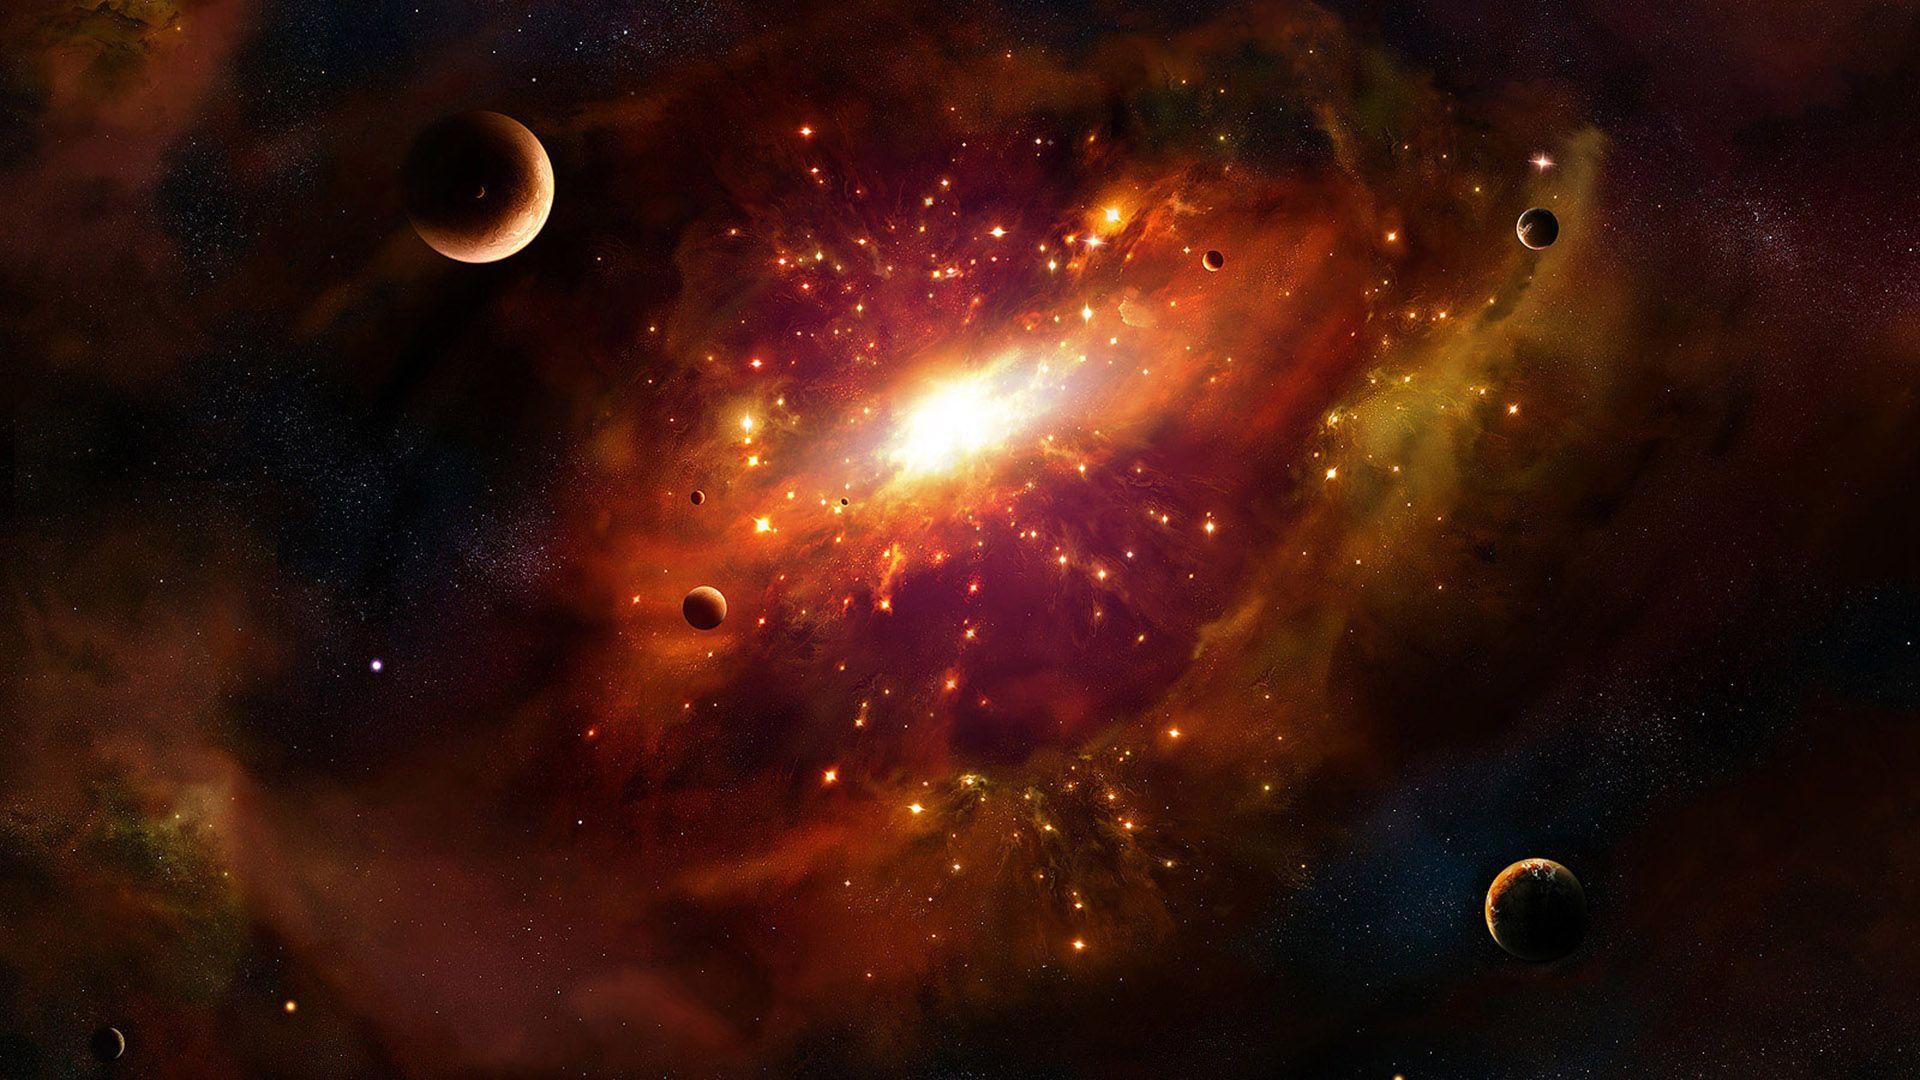 3d Amazing Pictures Hd Galaxy Wallpaper Nebula Galaxies Wallpaper